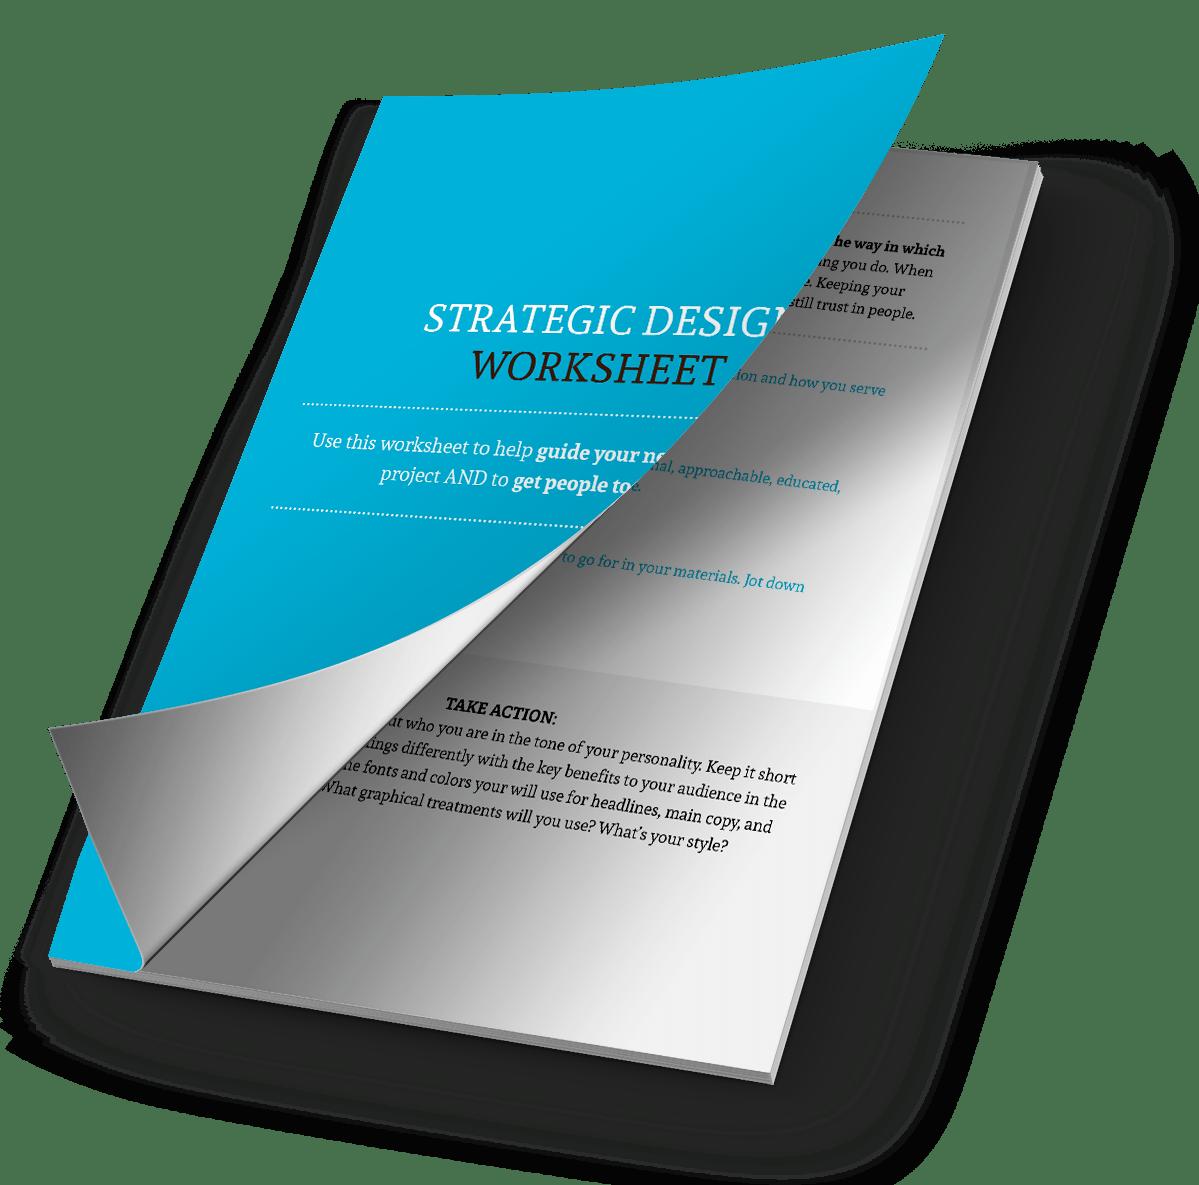 Strategic Design Worksheet